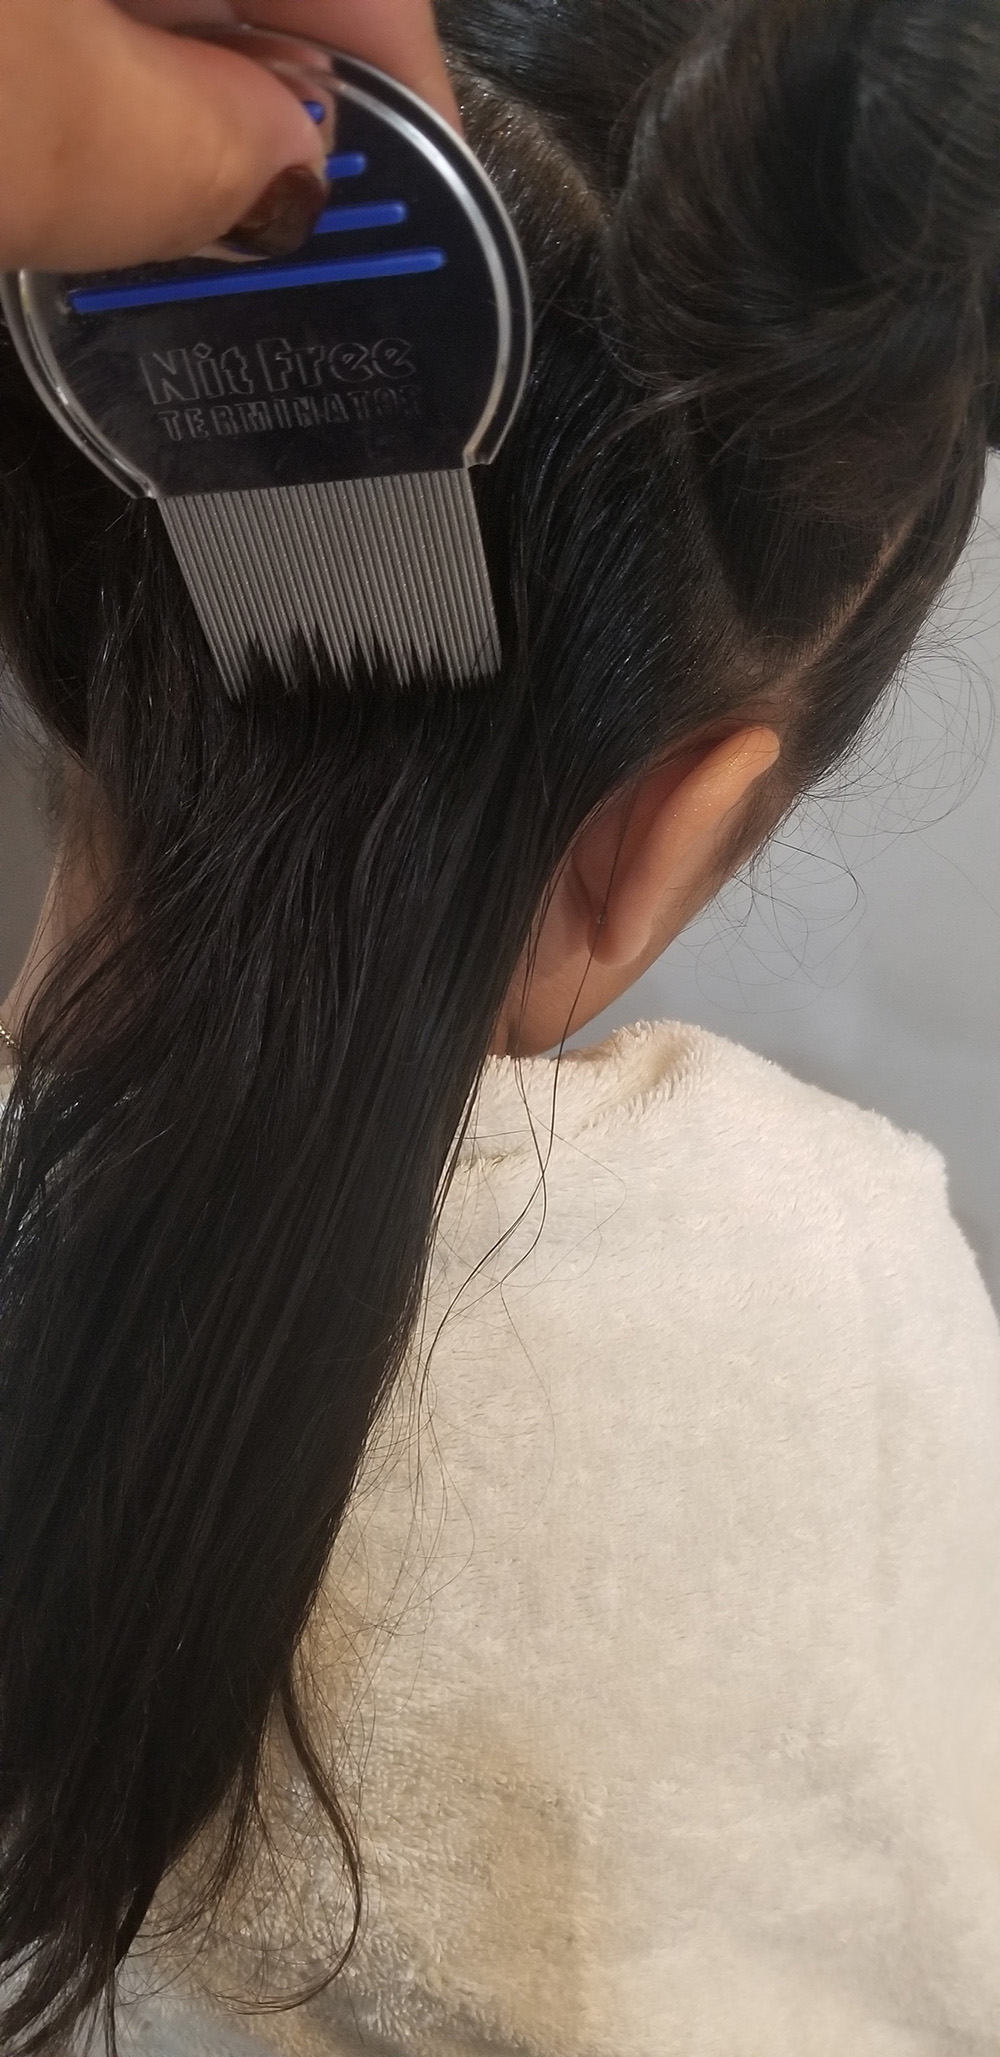 Lice Treatment in Cambridge and Brookline, MA